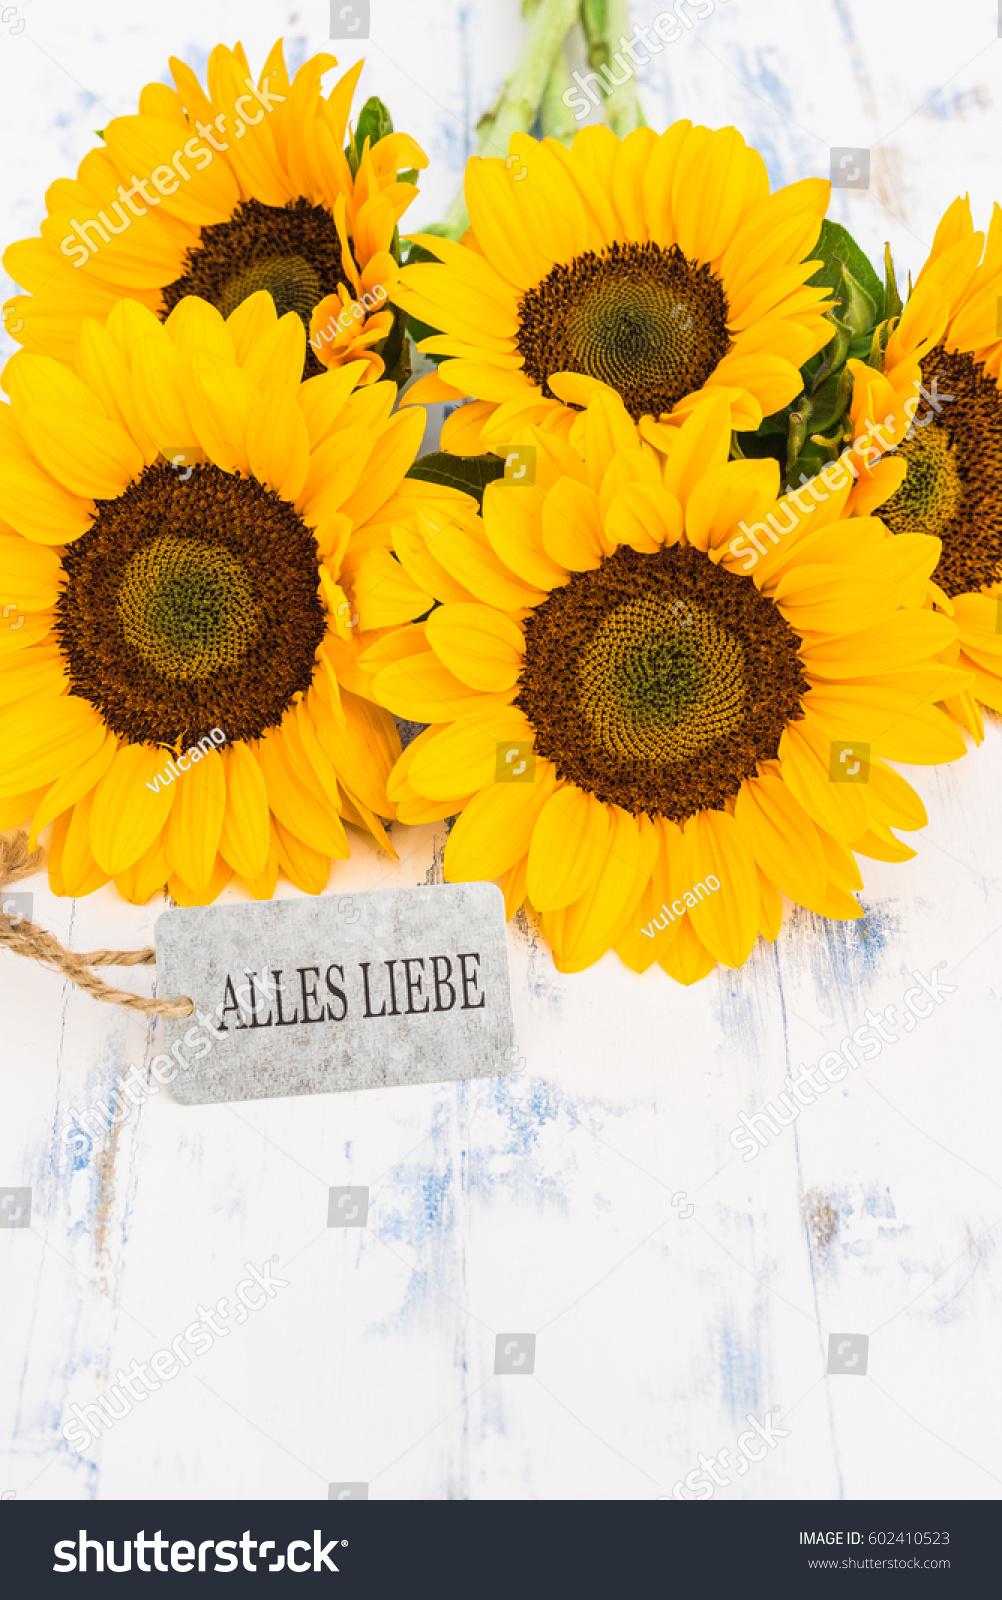 Bouquet Sunflowers German Text Alles Liebe Stock Photo Edit Now